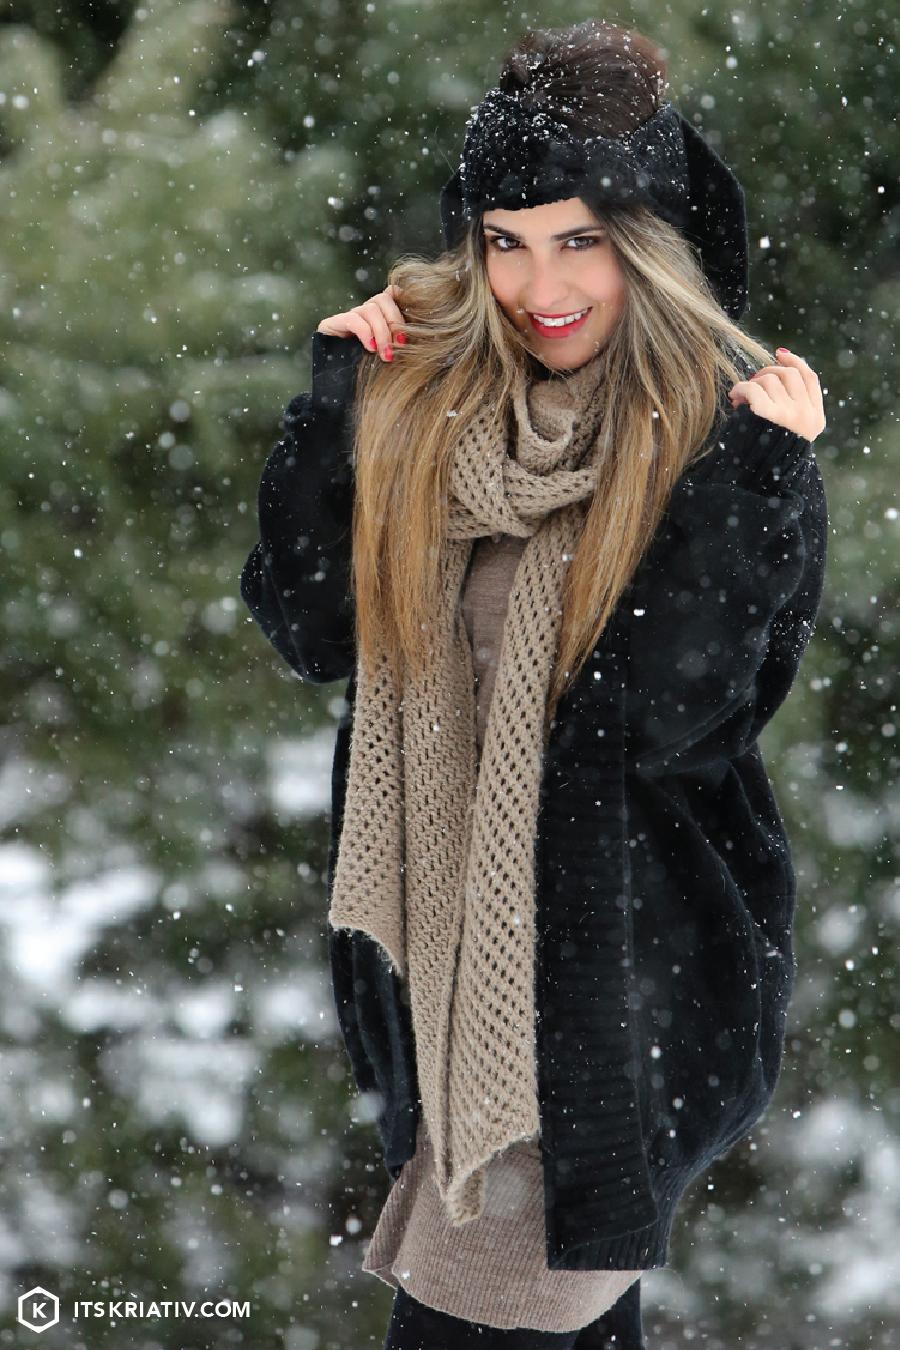 Its-Kriativ-Fashion-Let-It-Snow-Winter-03.jpg